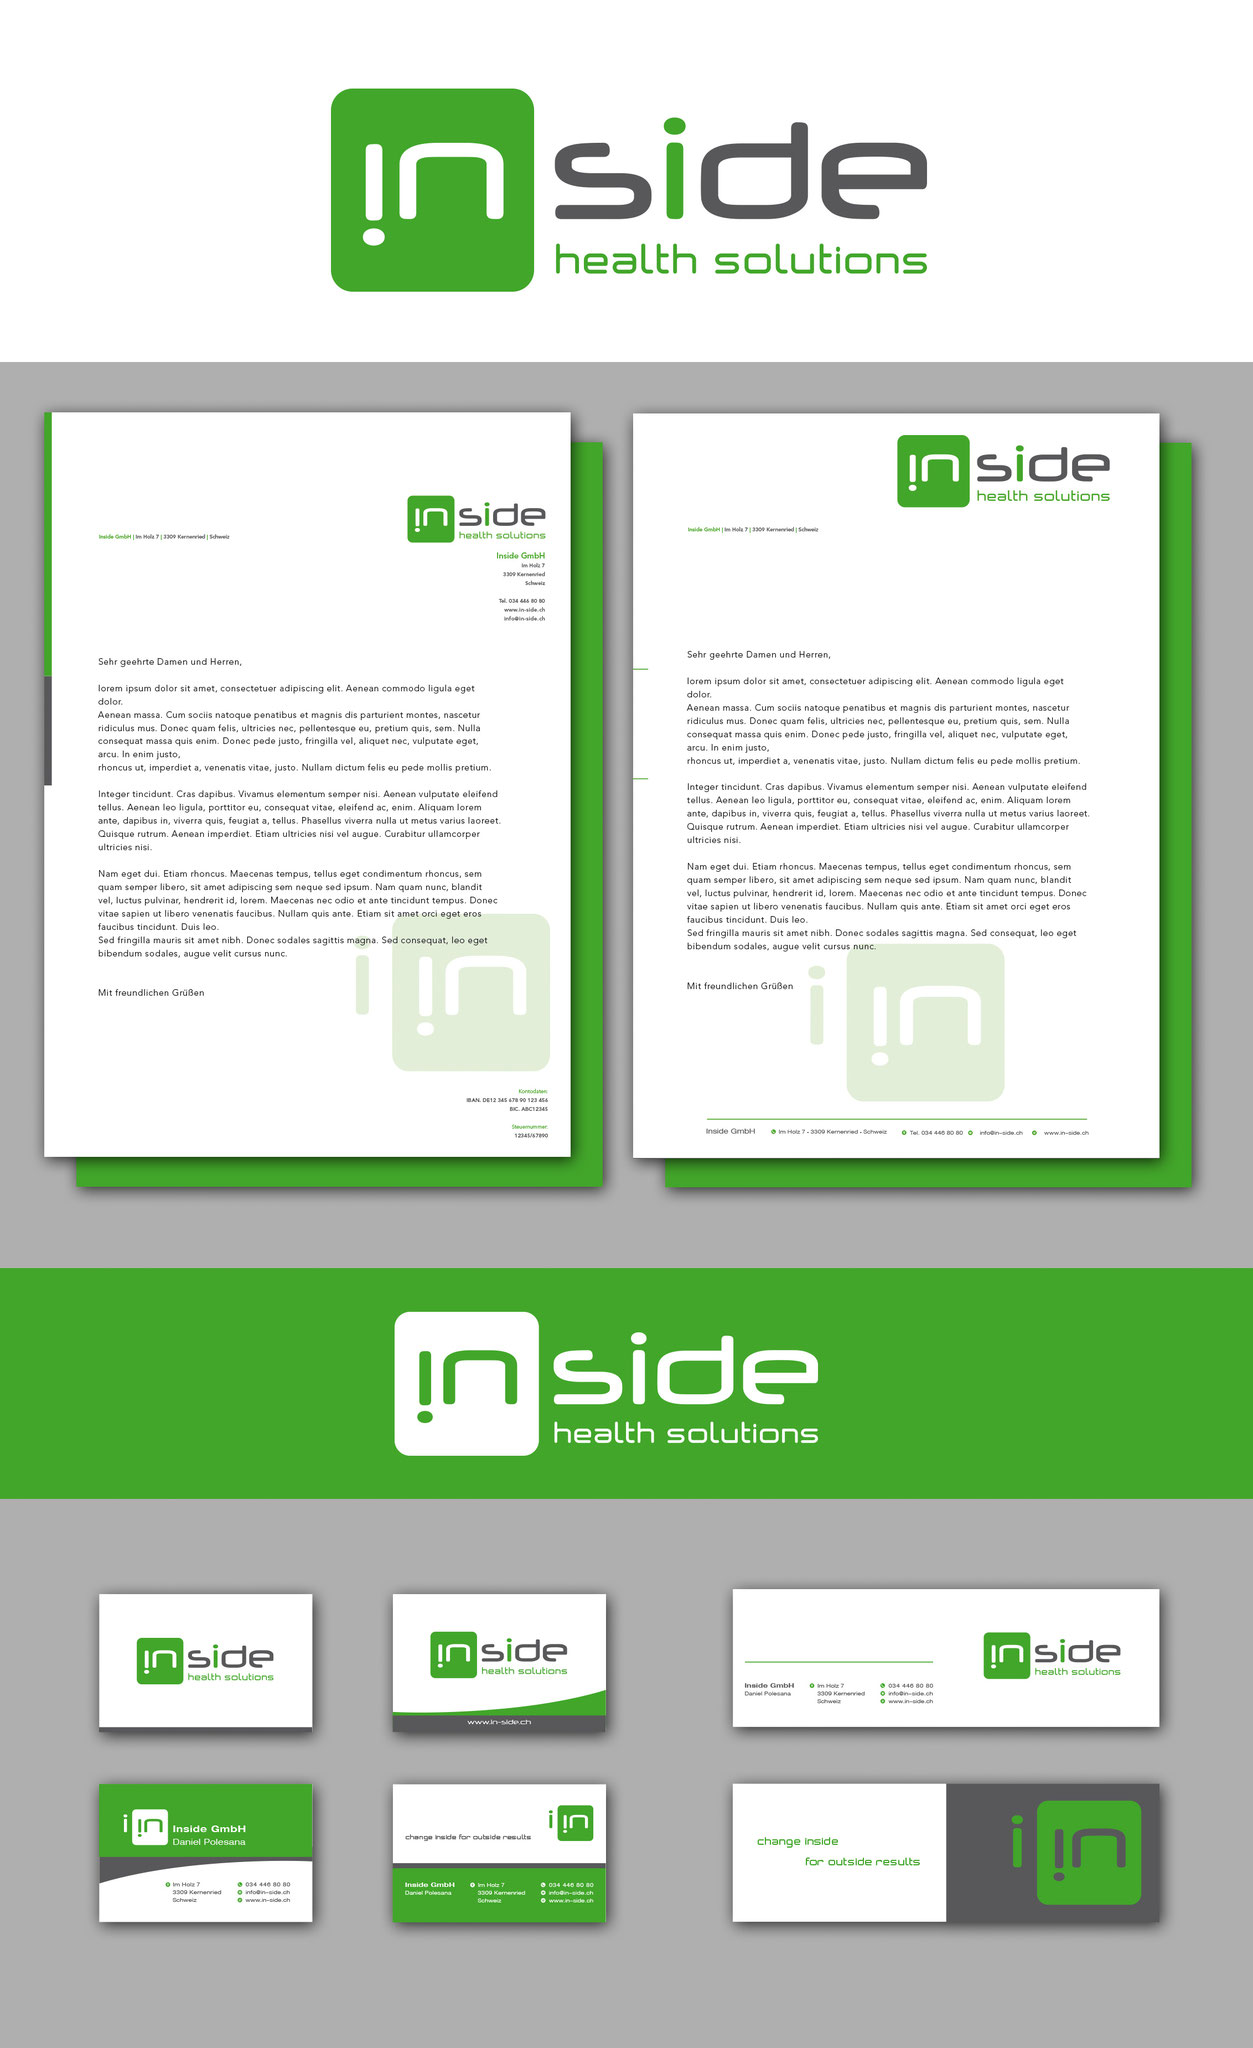 inside health solutions - CI